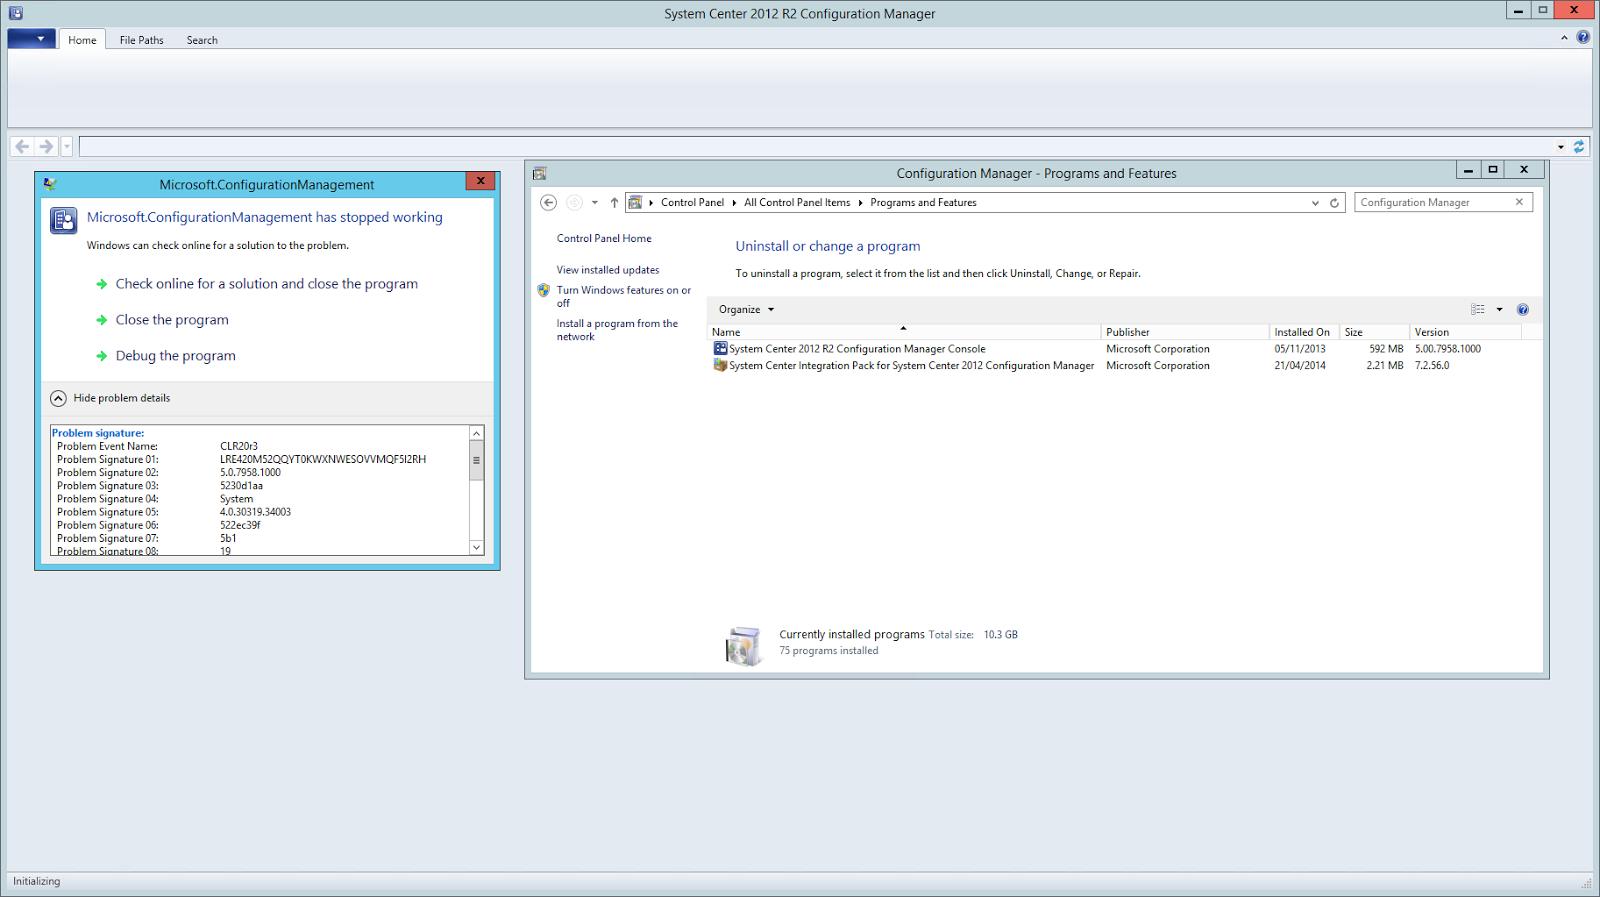 Microsoft System Center Suite: April 2014